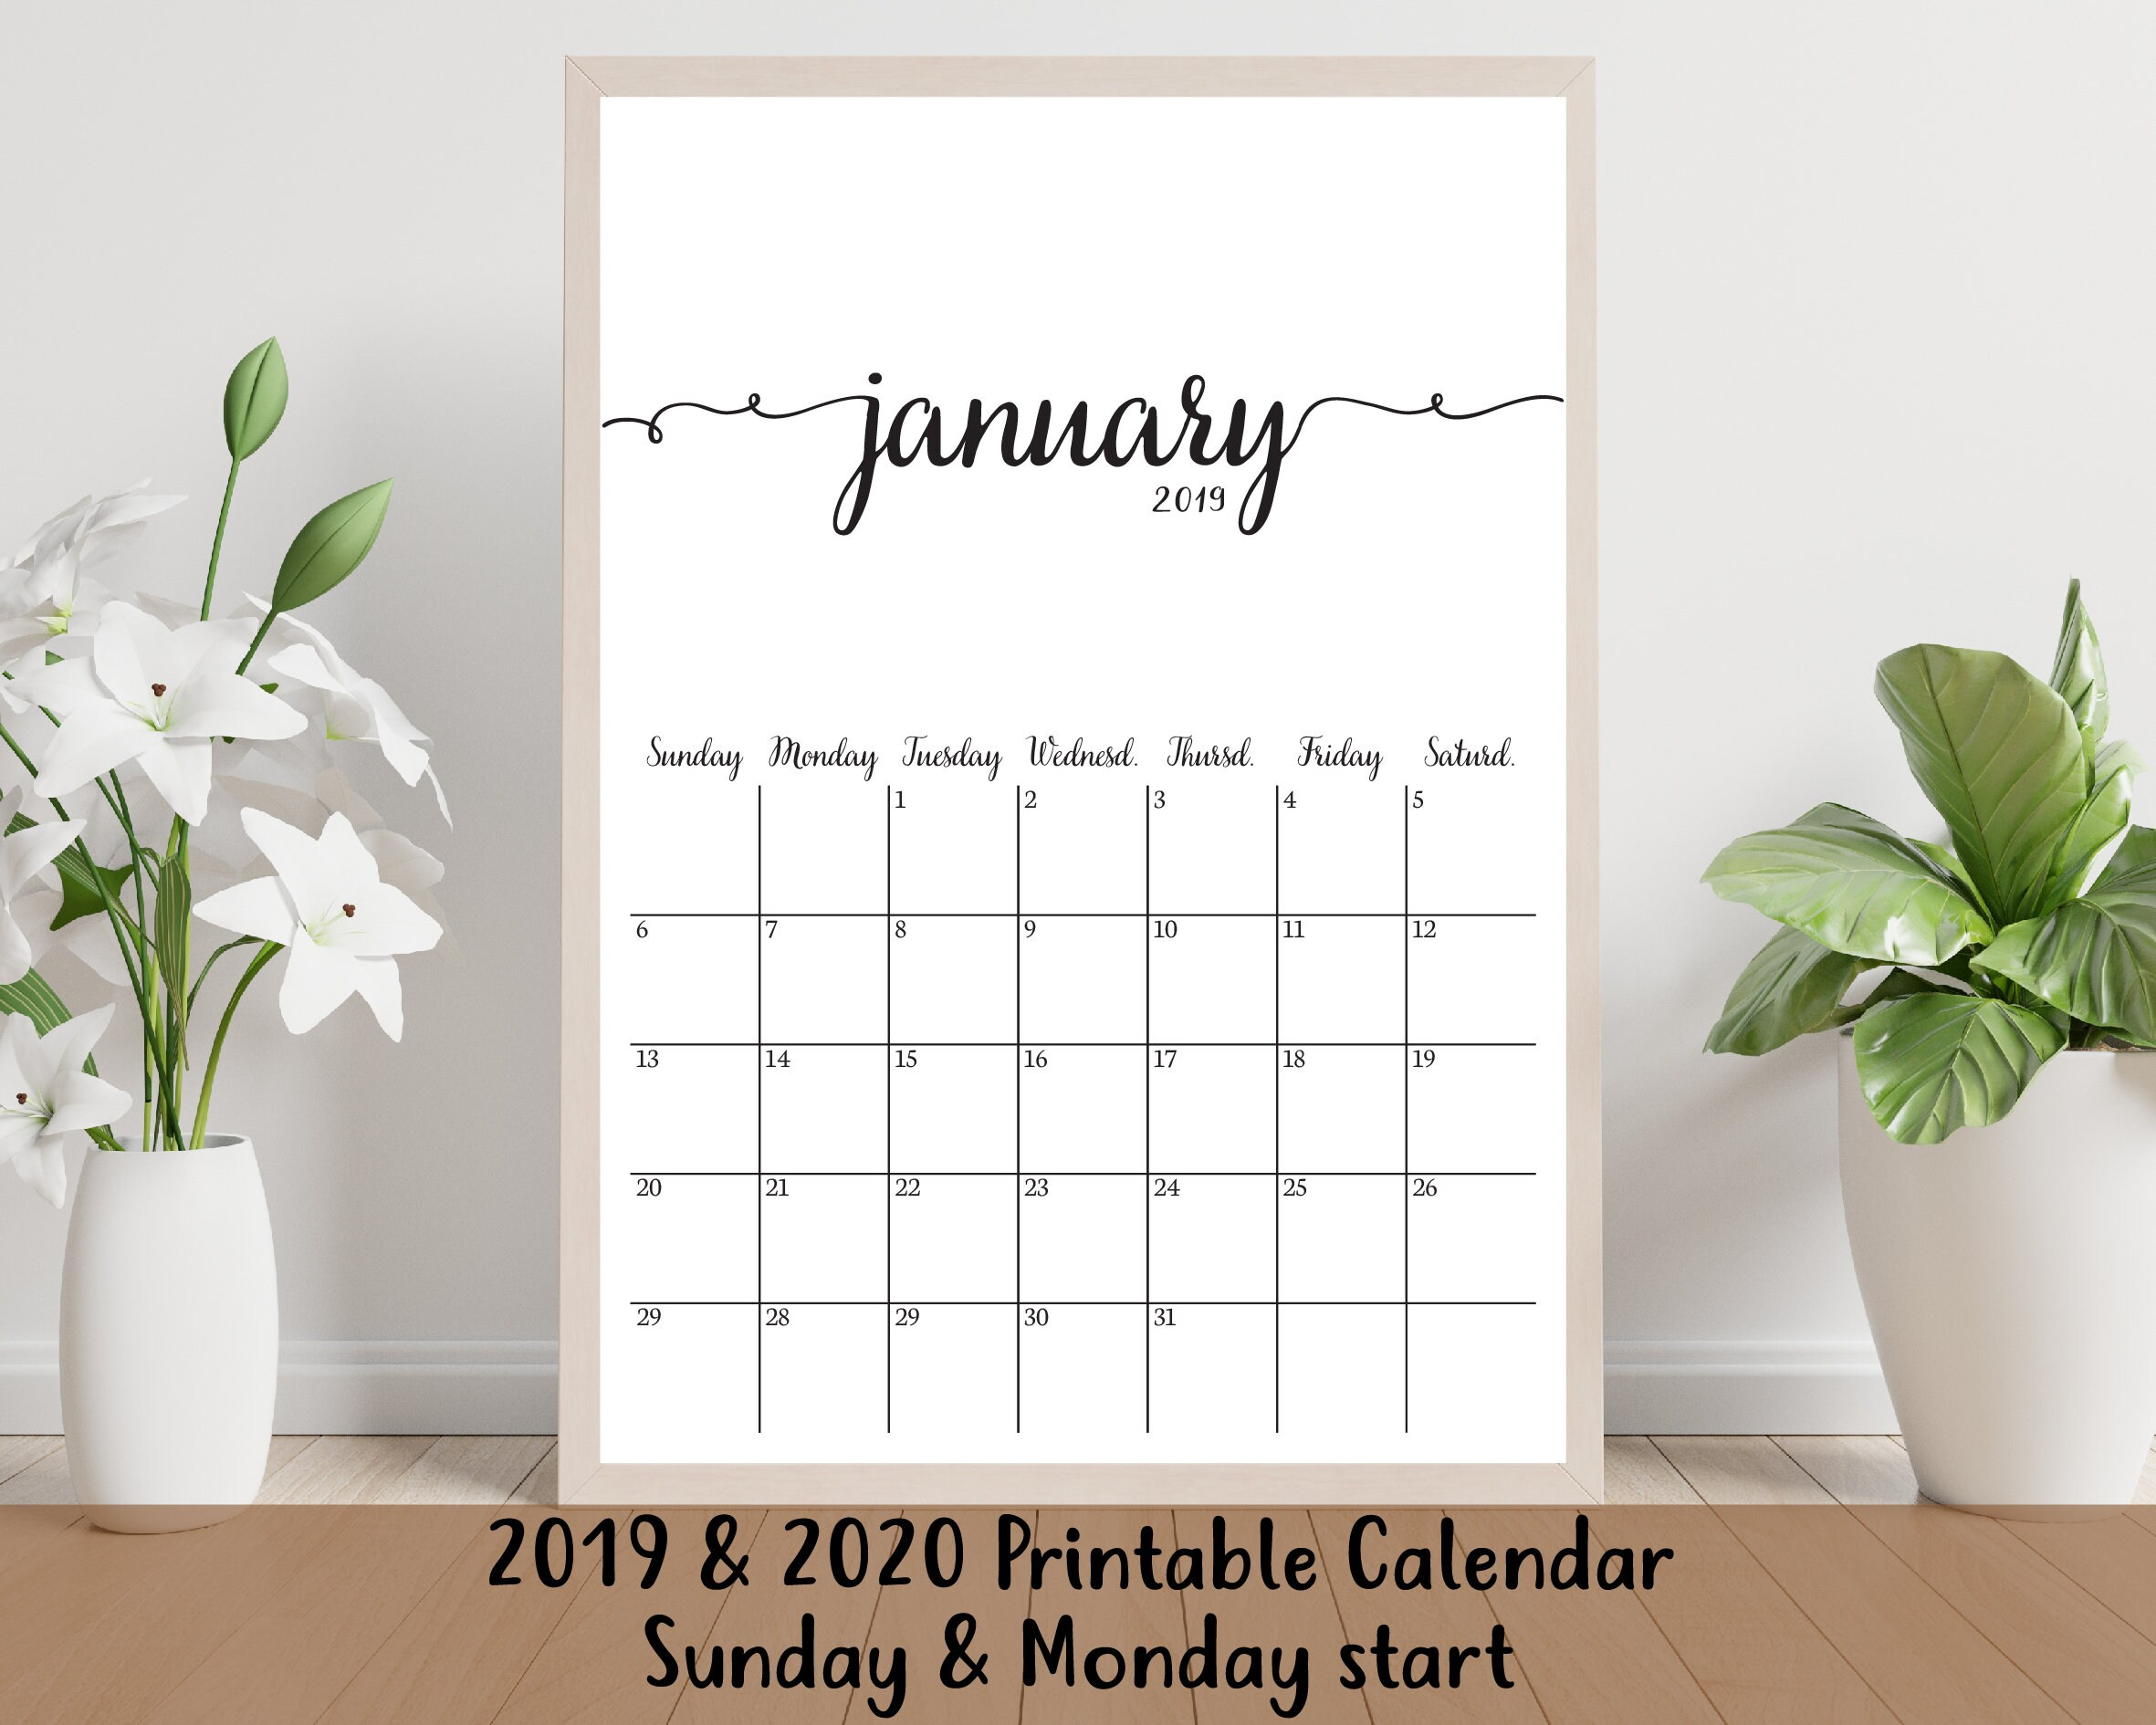 December 2020 December Calendar Svg 2019 Calendar Printable 2019 & 2020 Calendar Template   Etsy